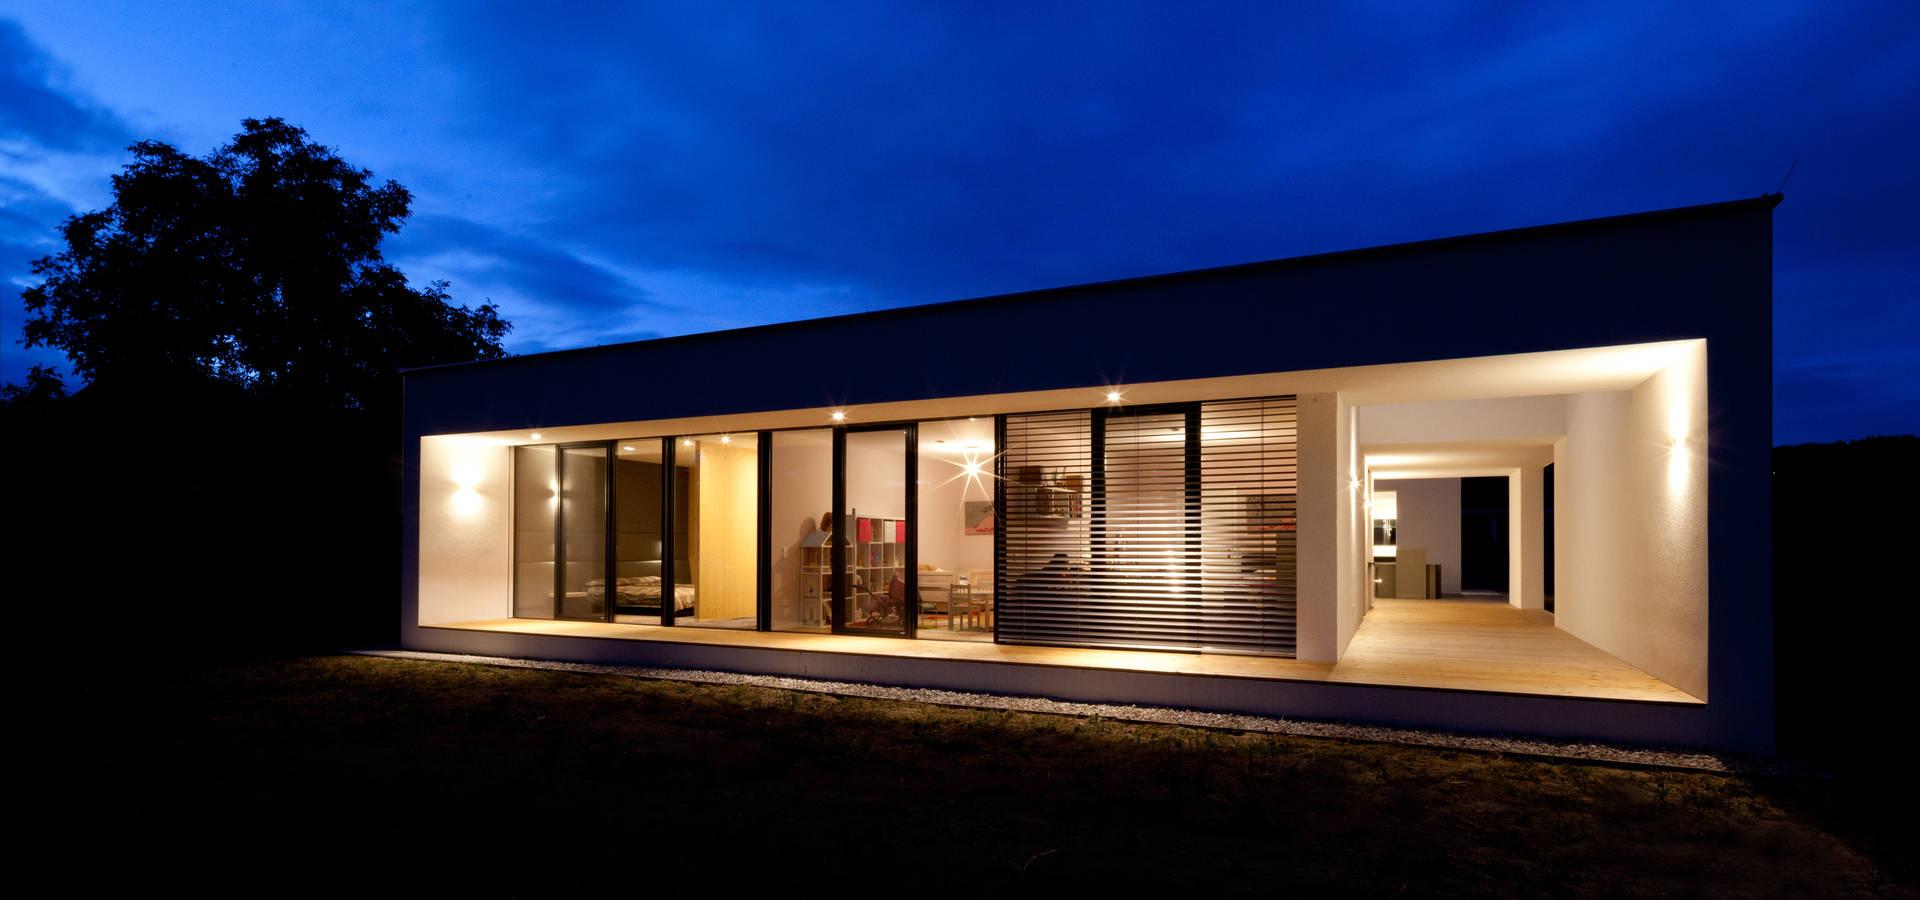 moderner bungalow mit atrium by paschinger architekten zt kg homify. Black Bedroom Furniture Sets. Home Design Ideas